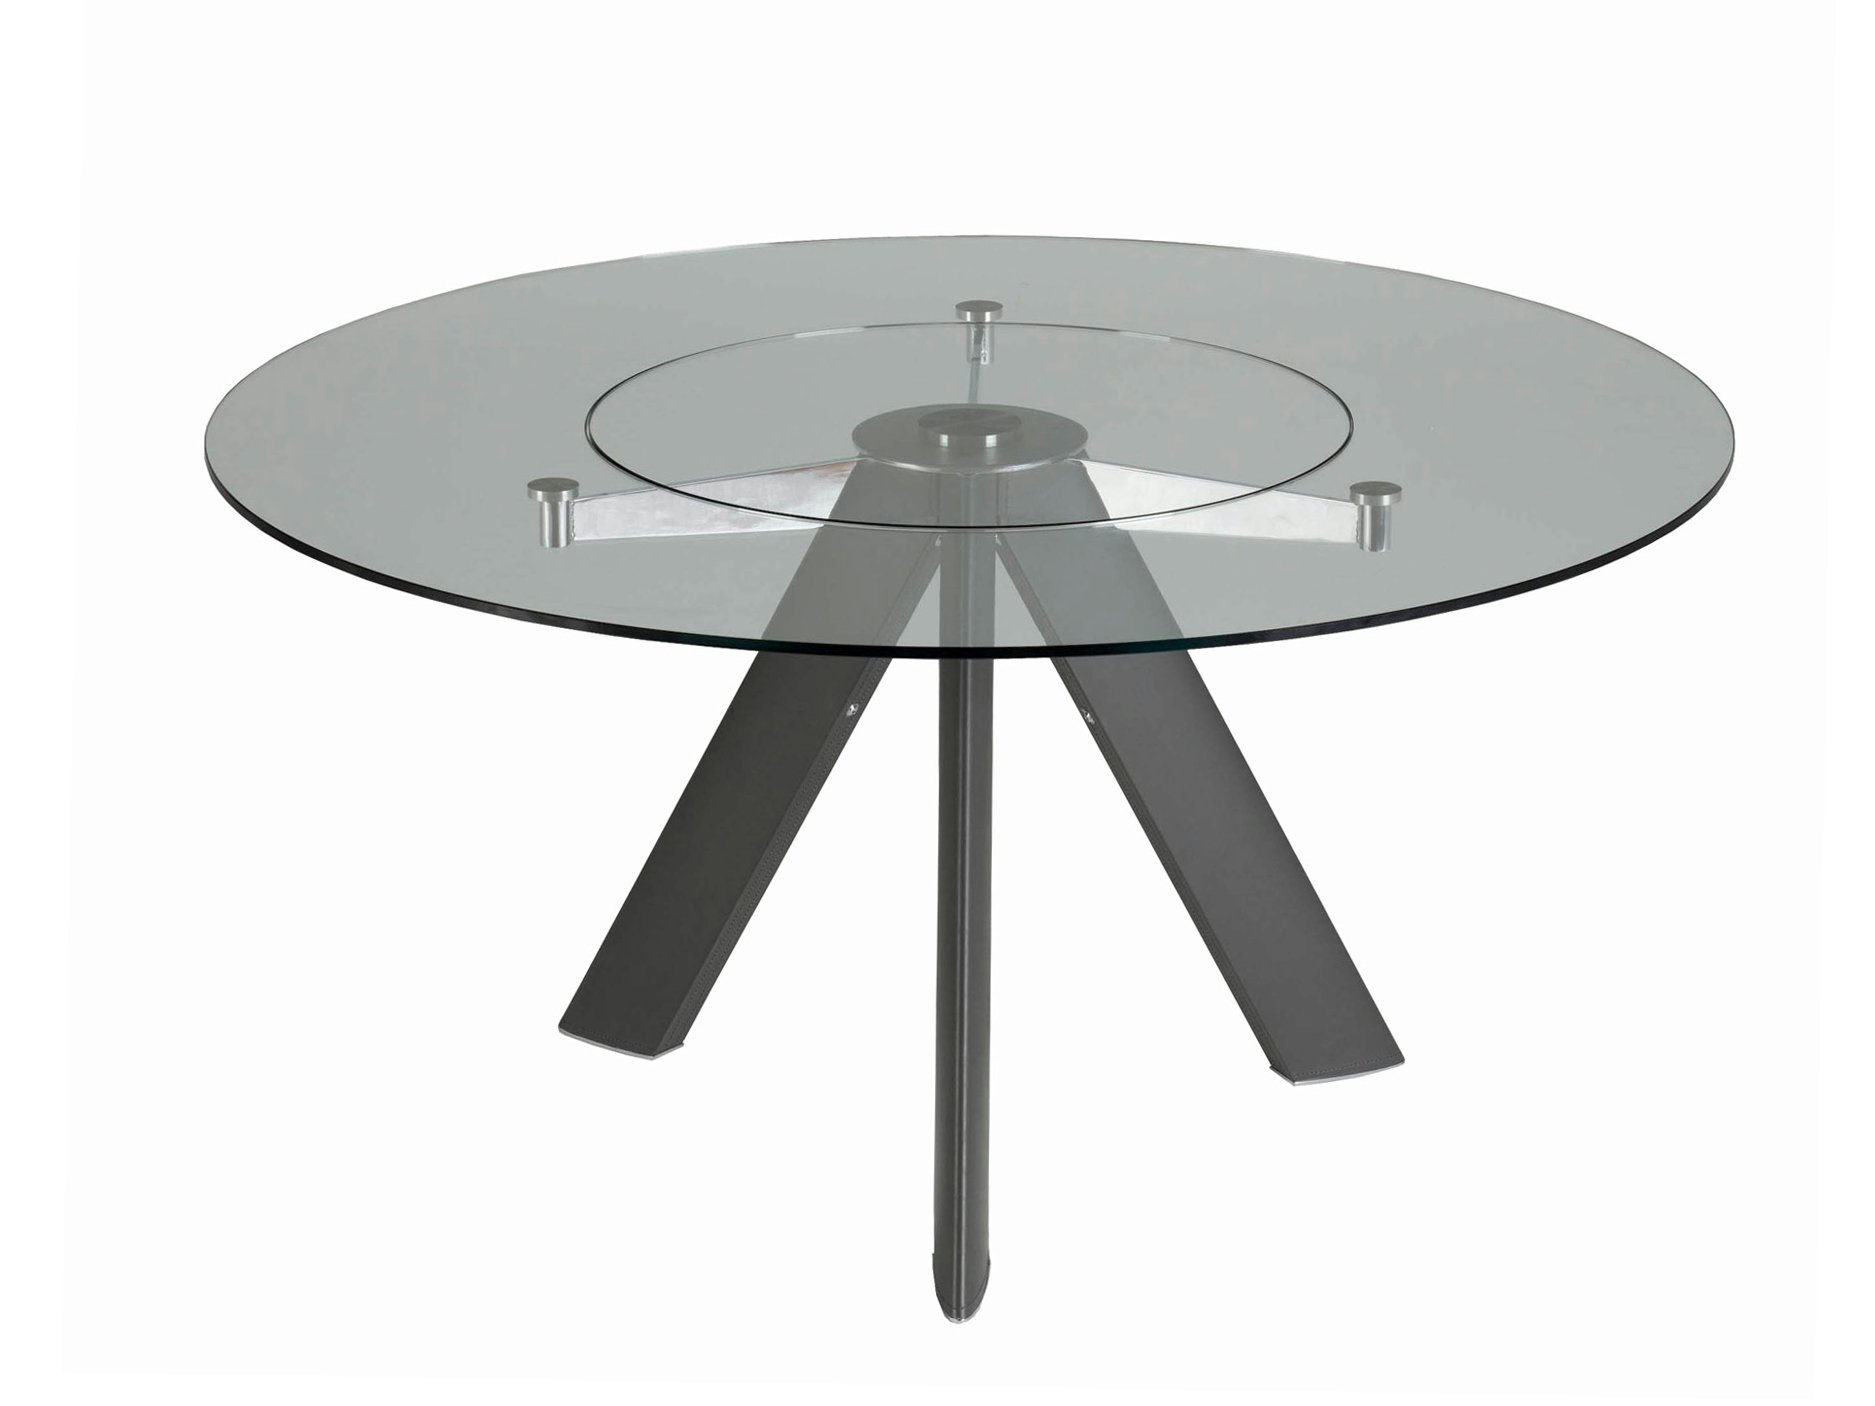 table manger en verre chronos table ronde collection les contemporains by roche bobois. Black Bedroom Furniture Sets. Home Design Ideas